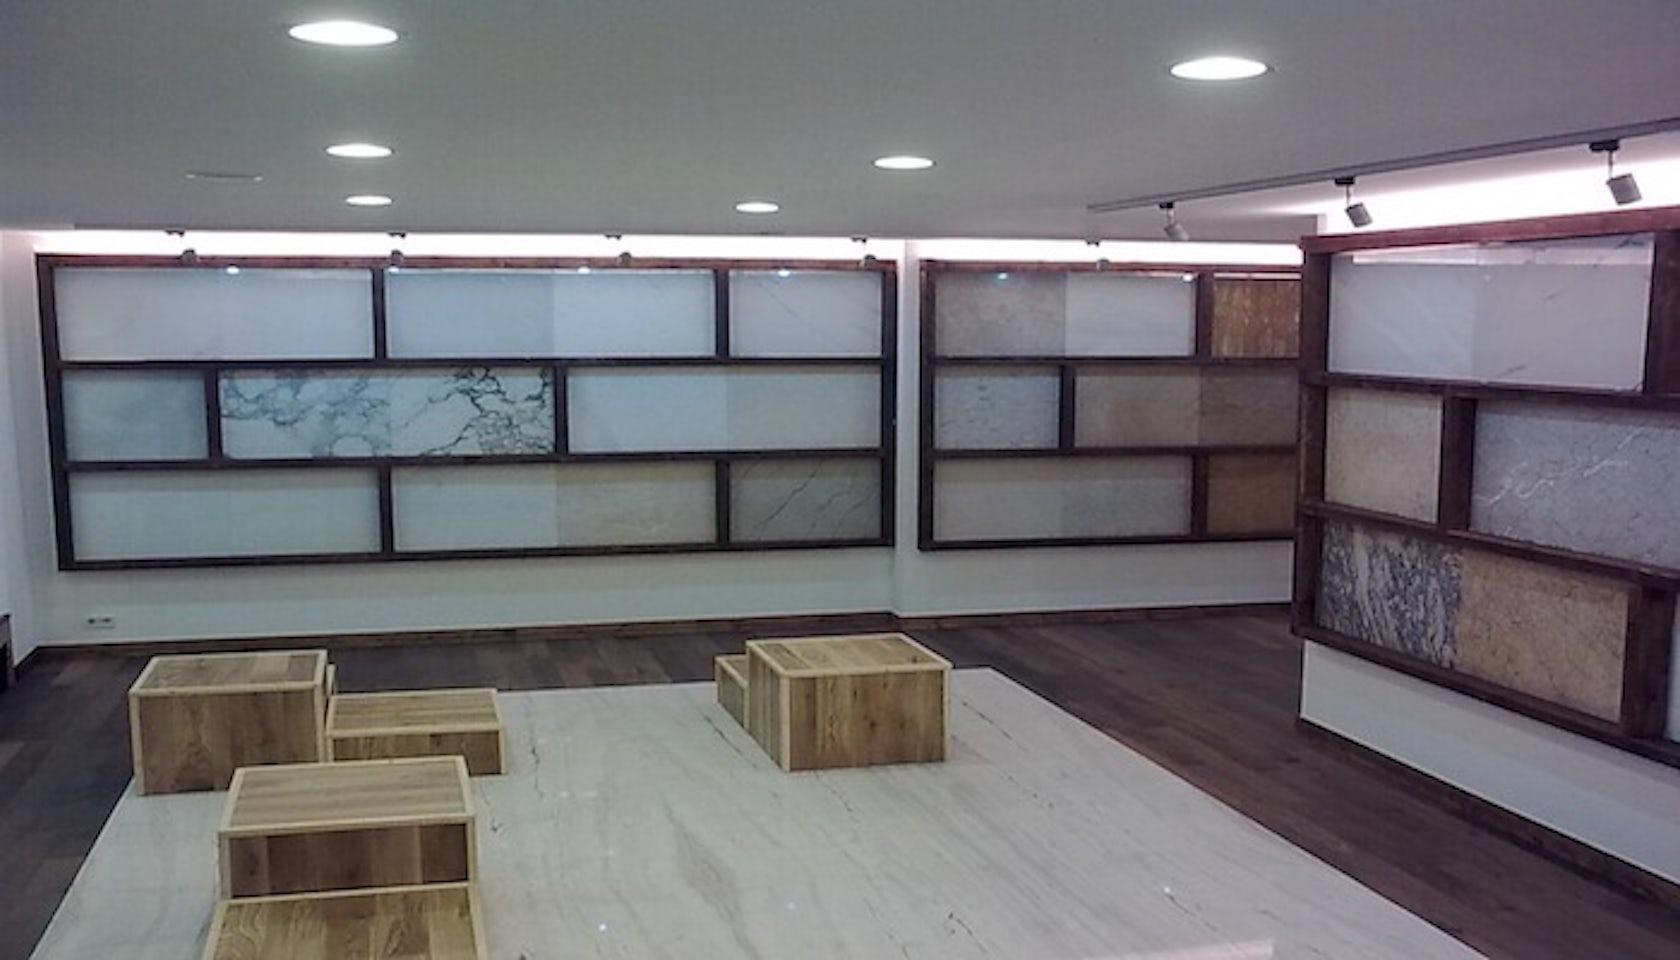 marmo italiano berlin showroom architizer. Black Bedroom Furniture Sets. Home Design Ideas